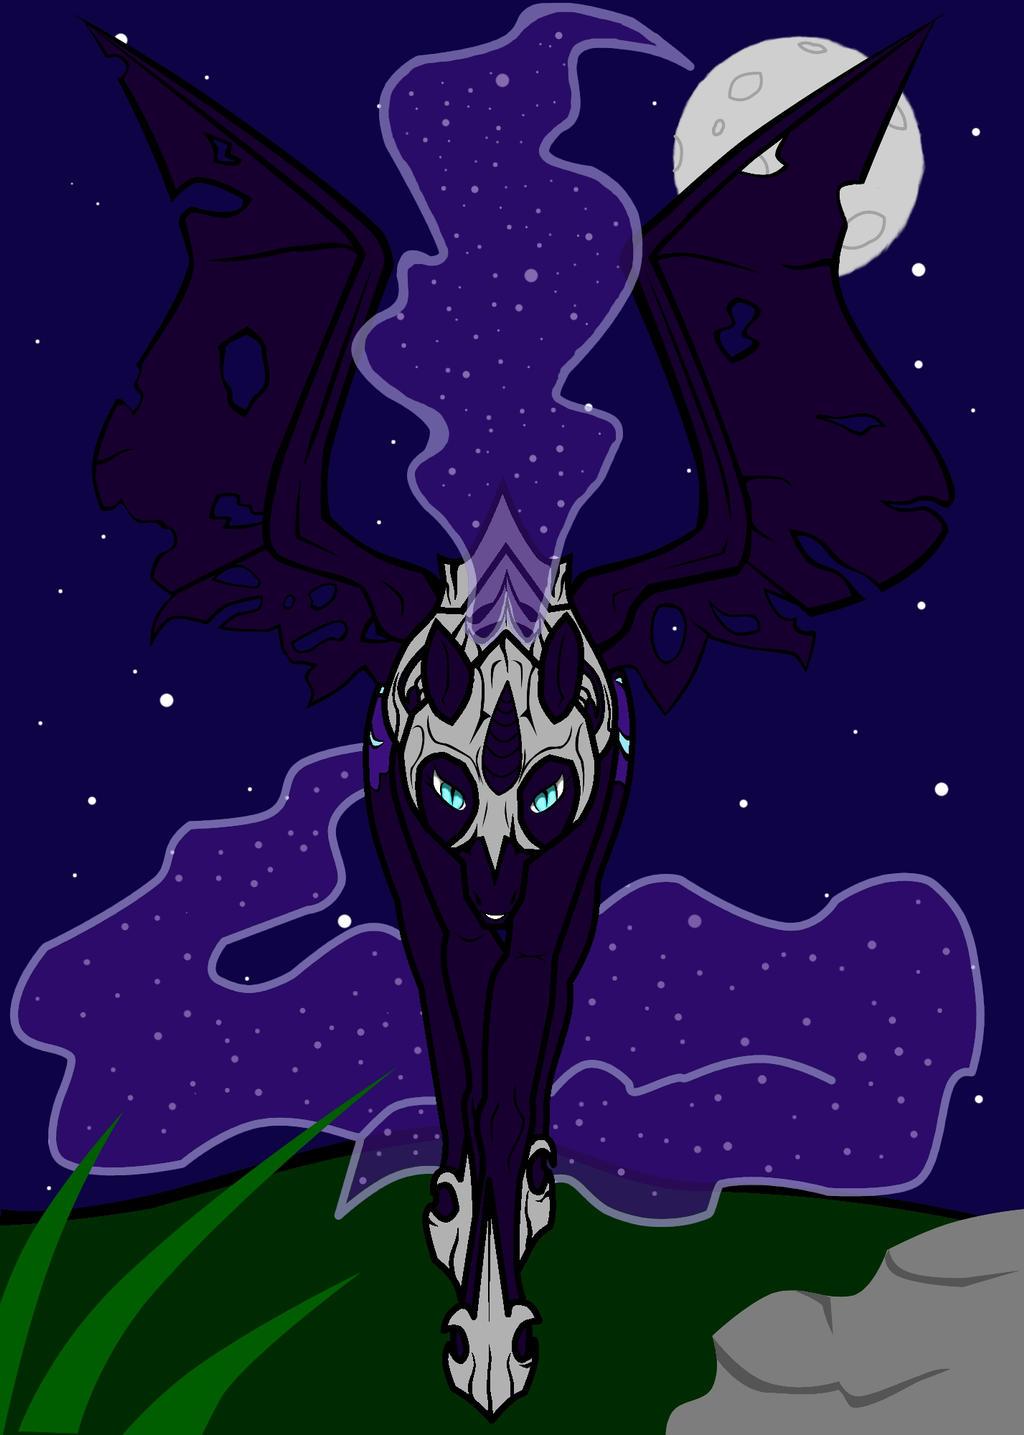 fallen_goddess_of_the_night_by_titanosau